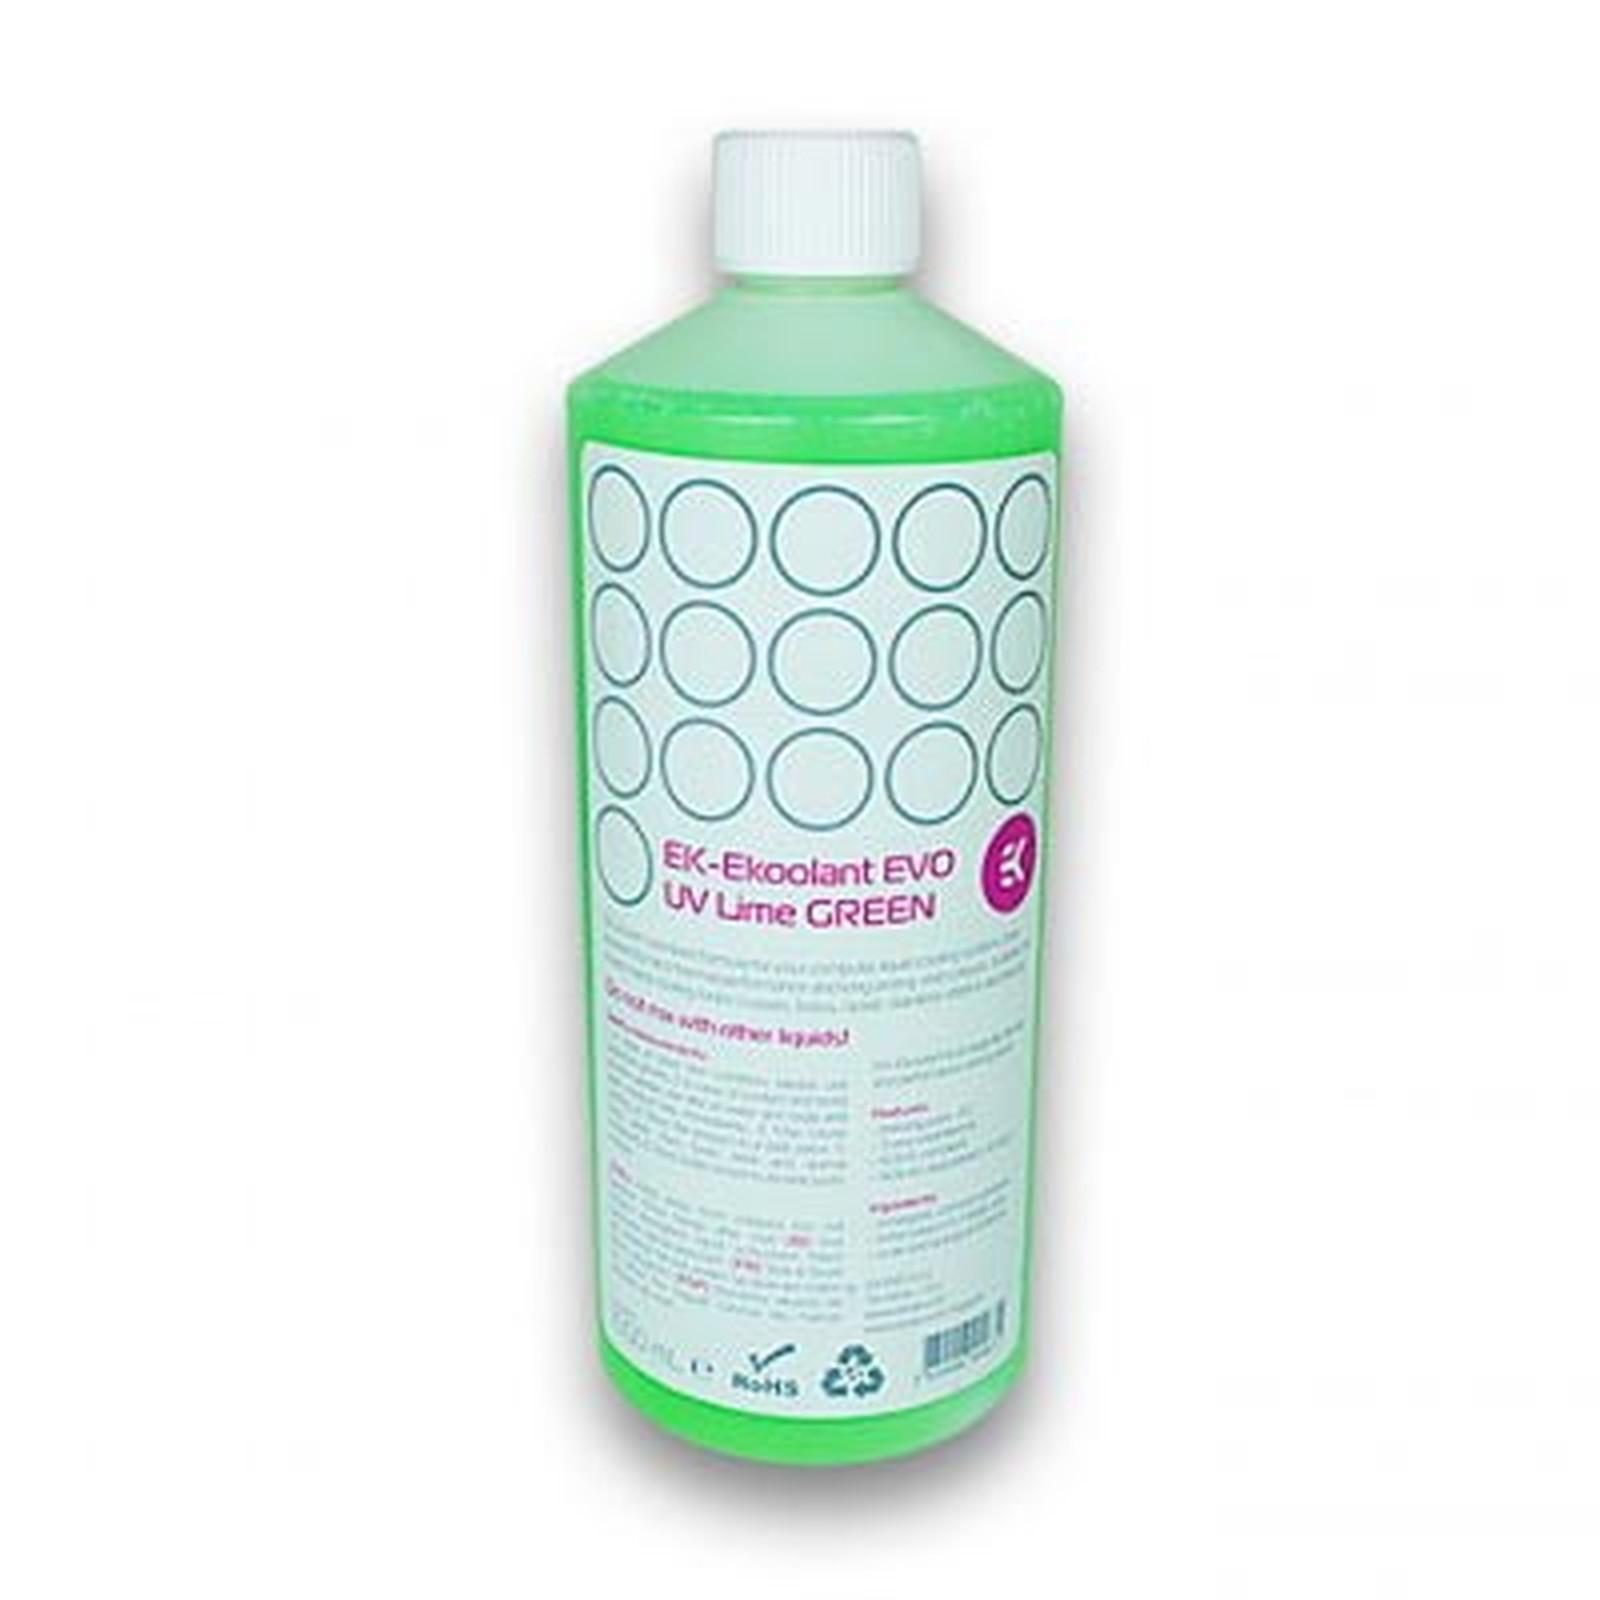 EK Water Blocks EK-Ekoolant EVO UV Lime GREEN